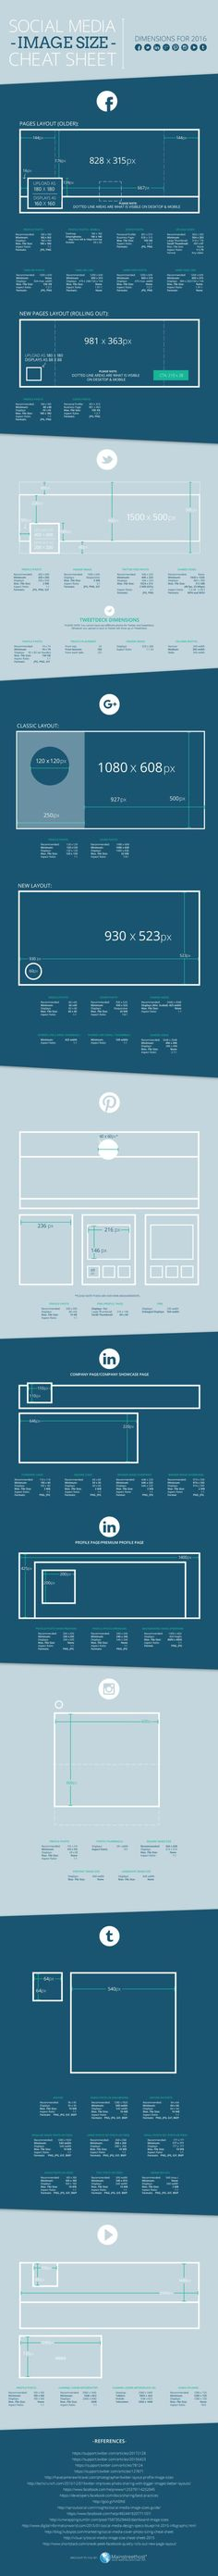 Alle Größen auf einen Blick. Social Media Bildgrößen 2016 [Infografik] - Futurebiz.de